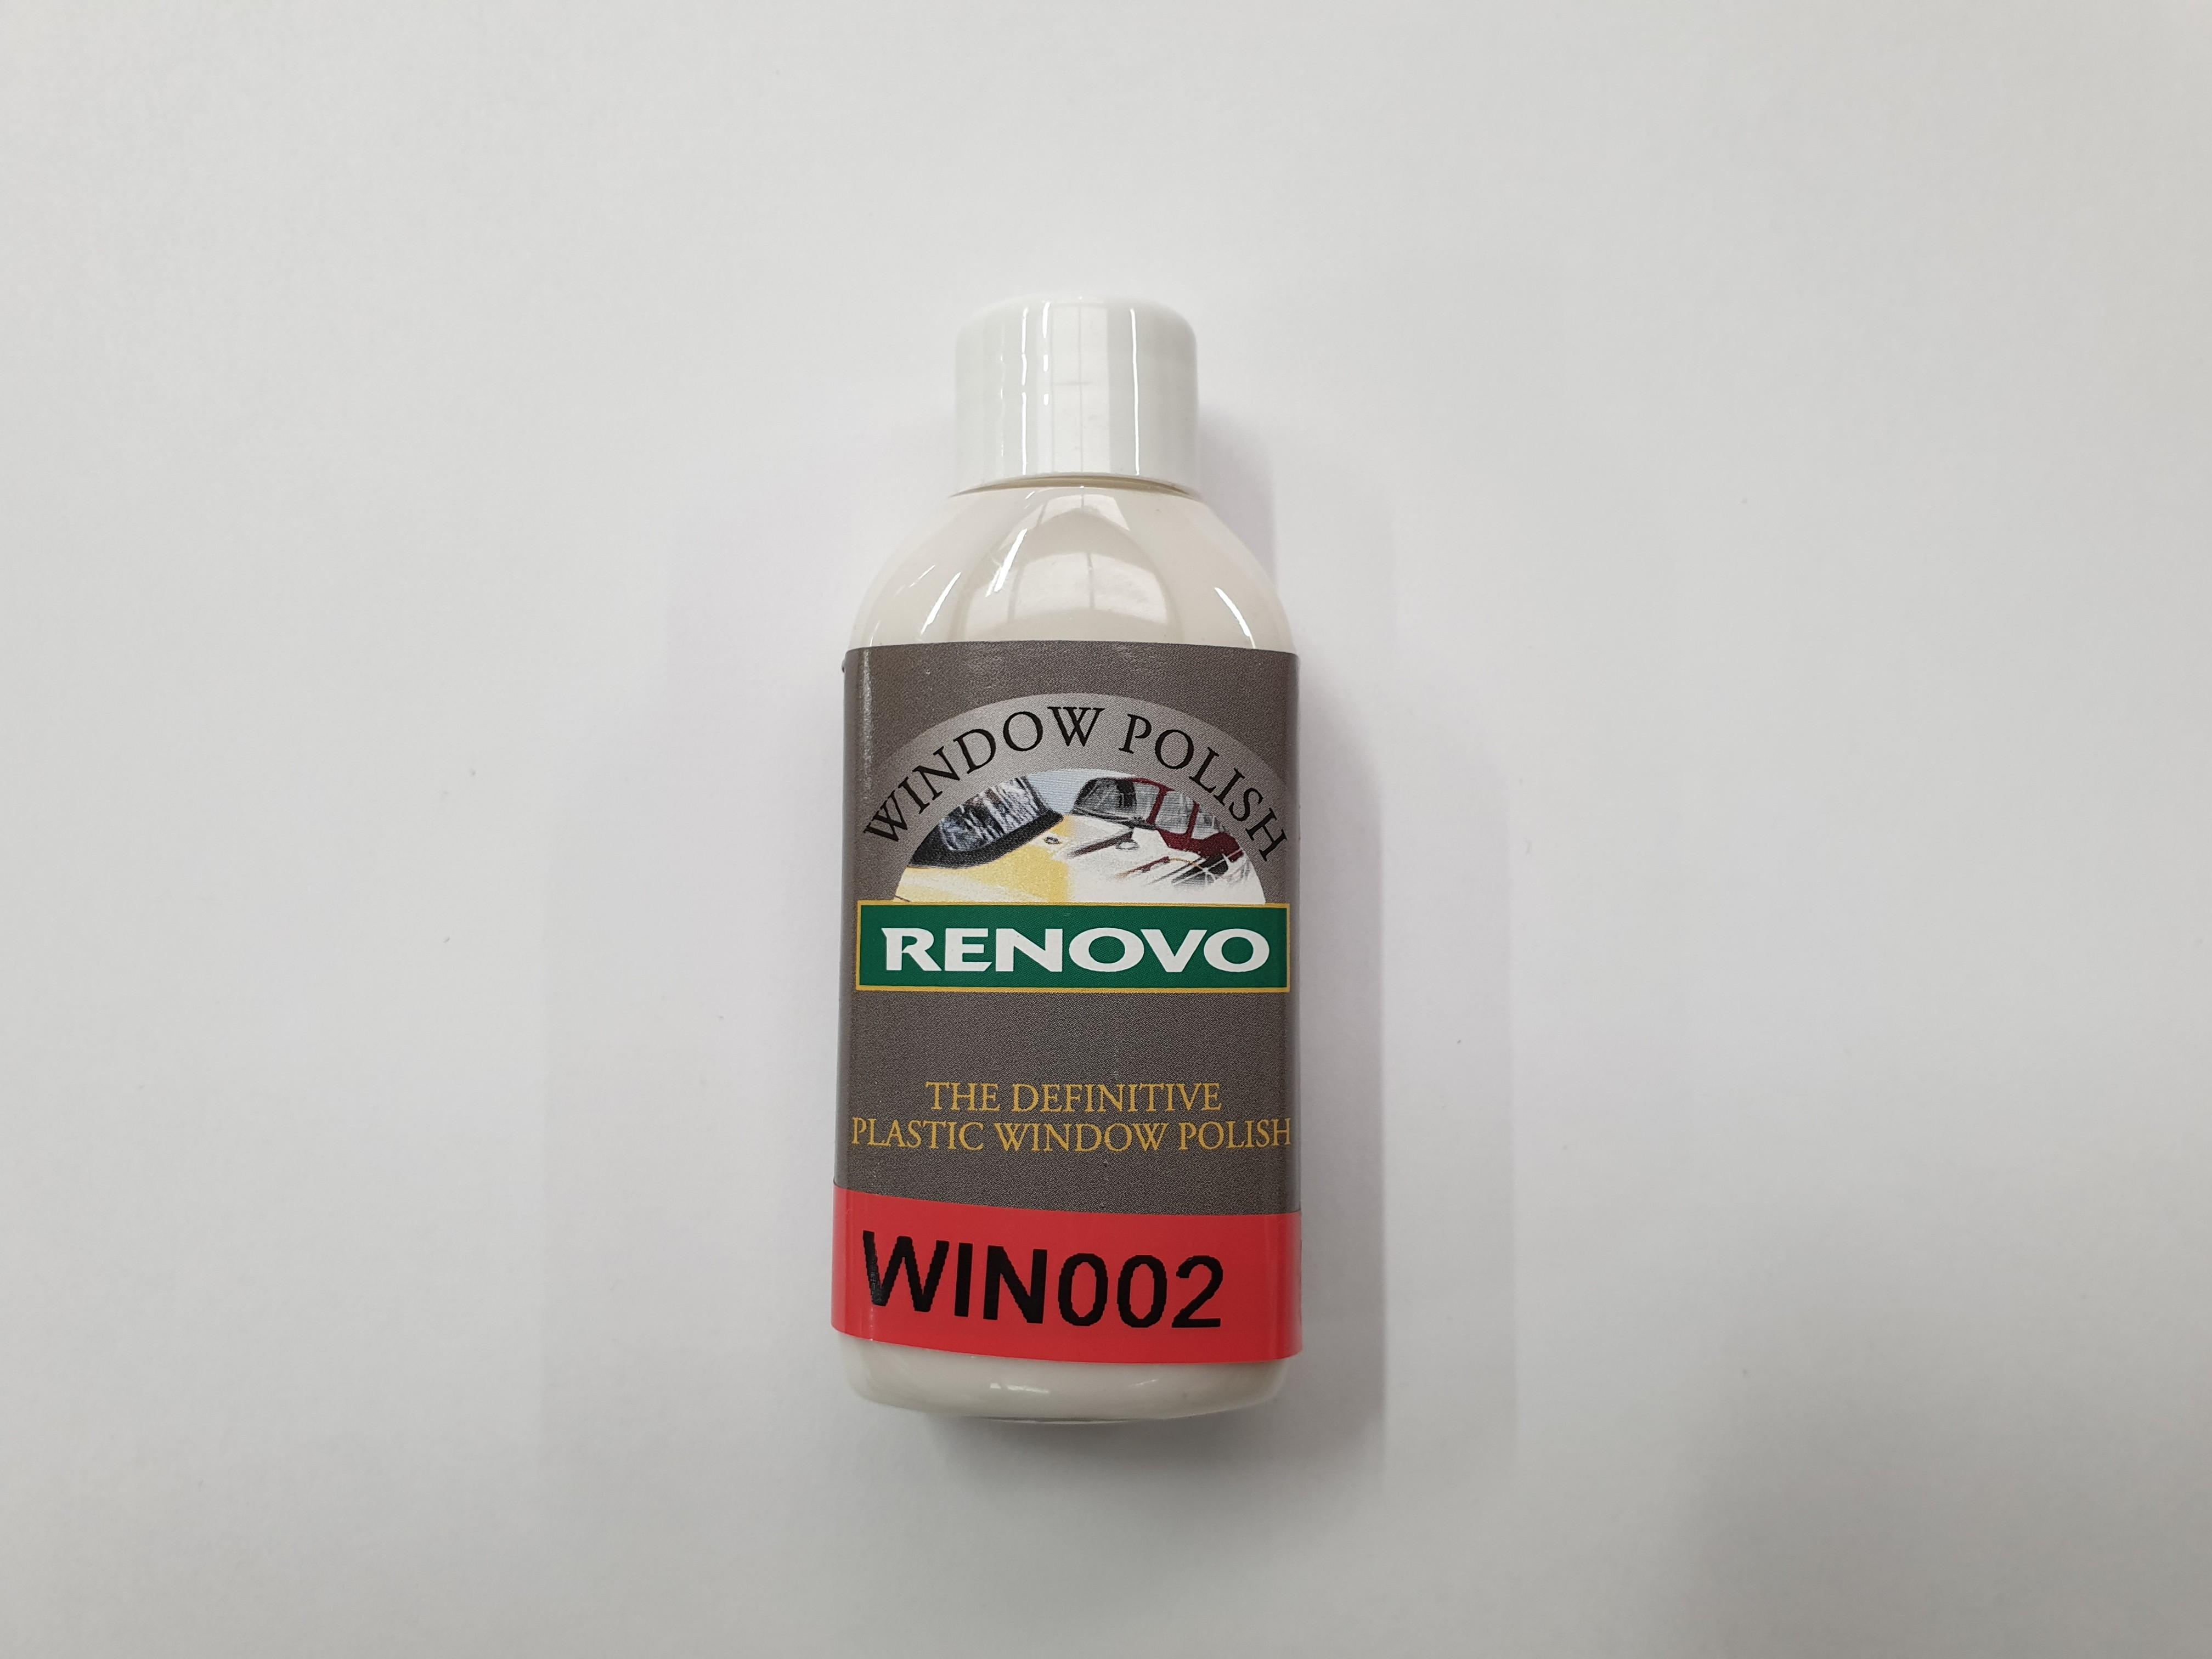 Renovo Window Polish